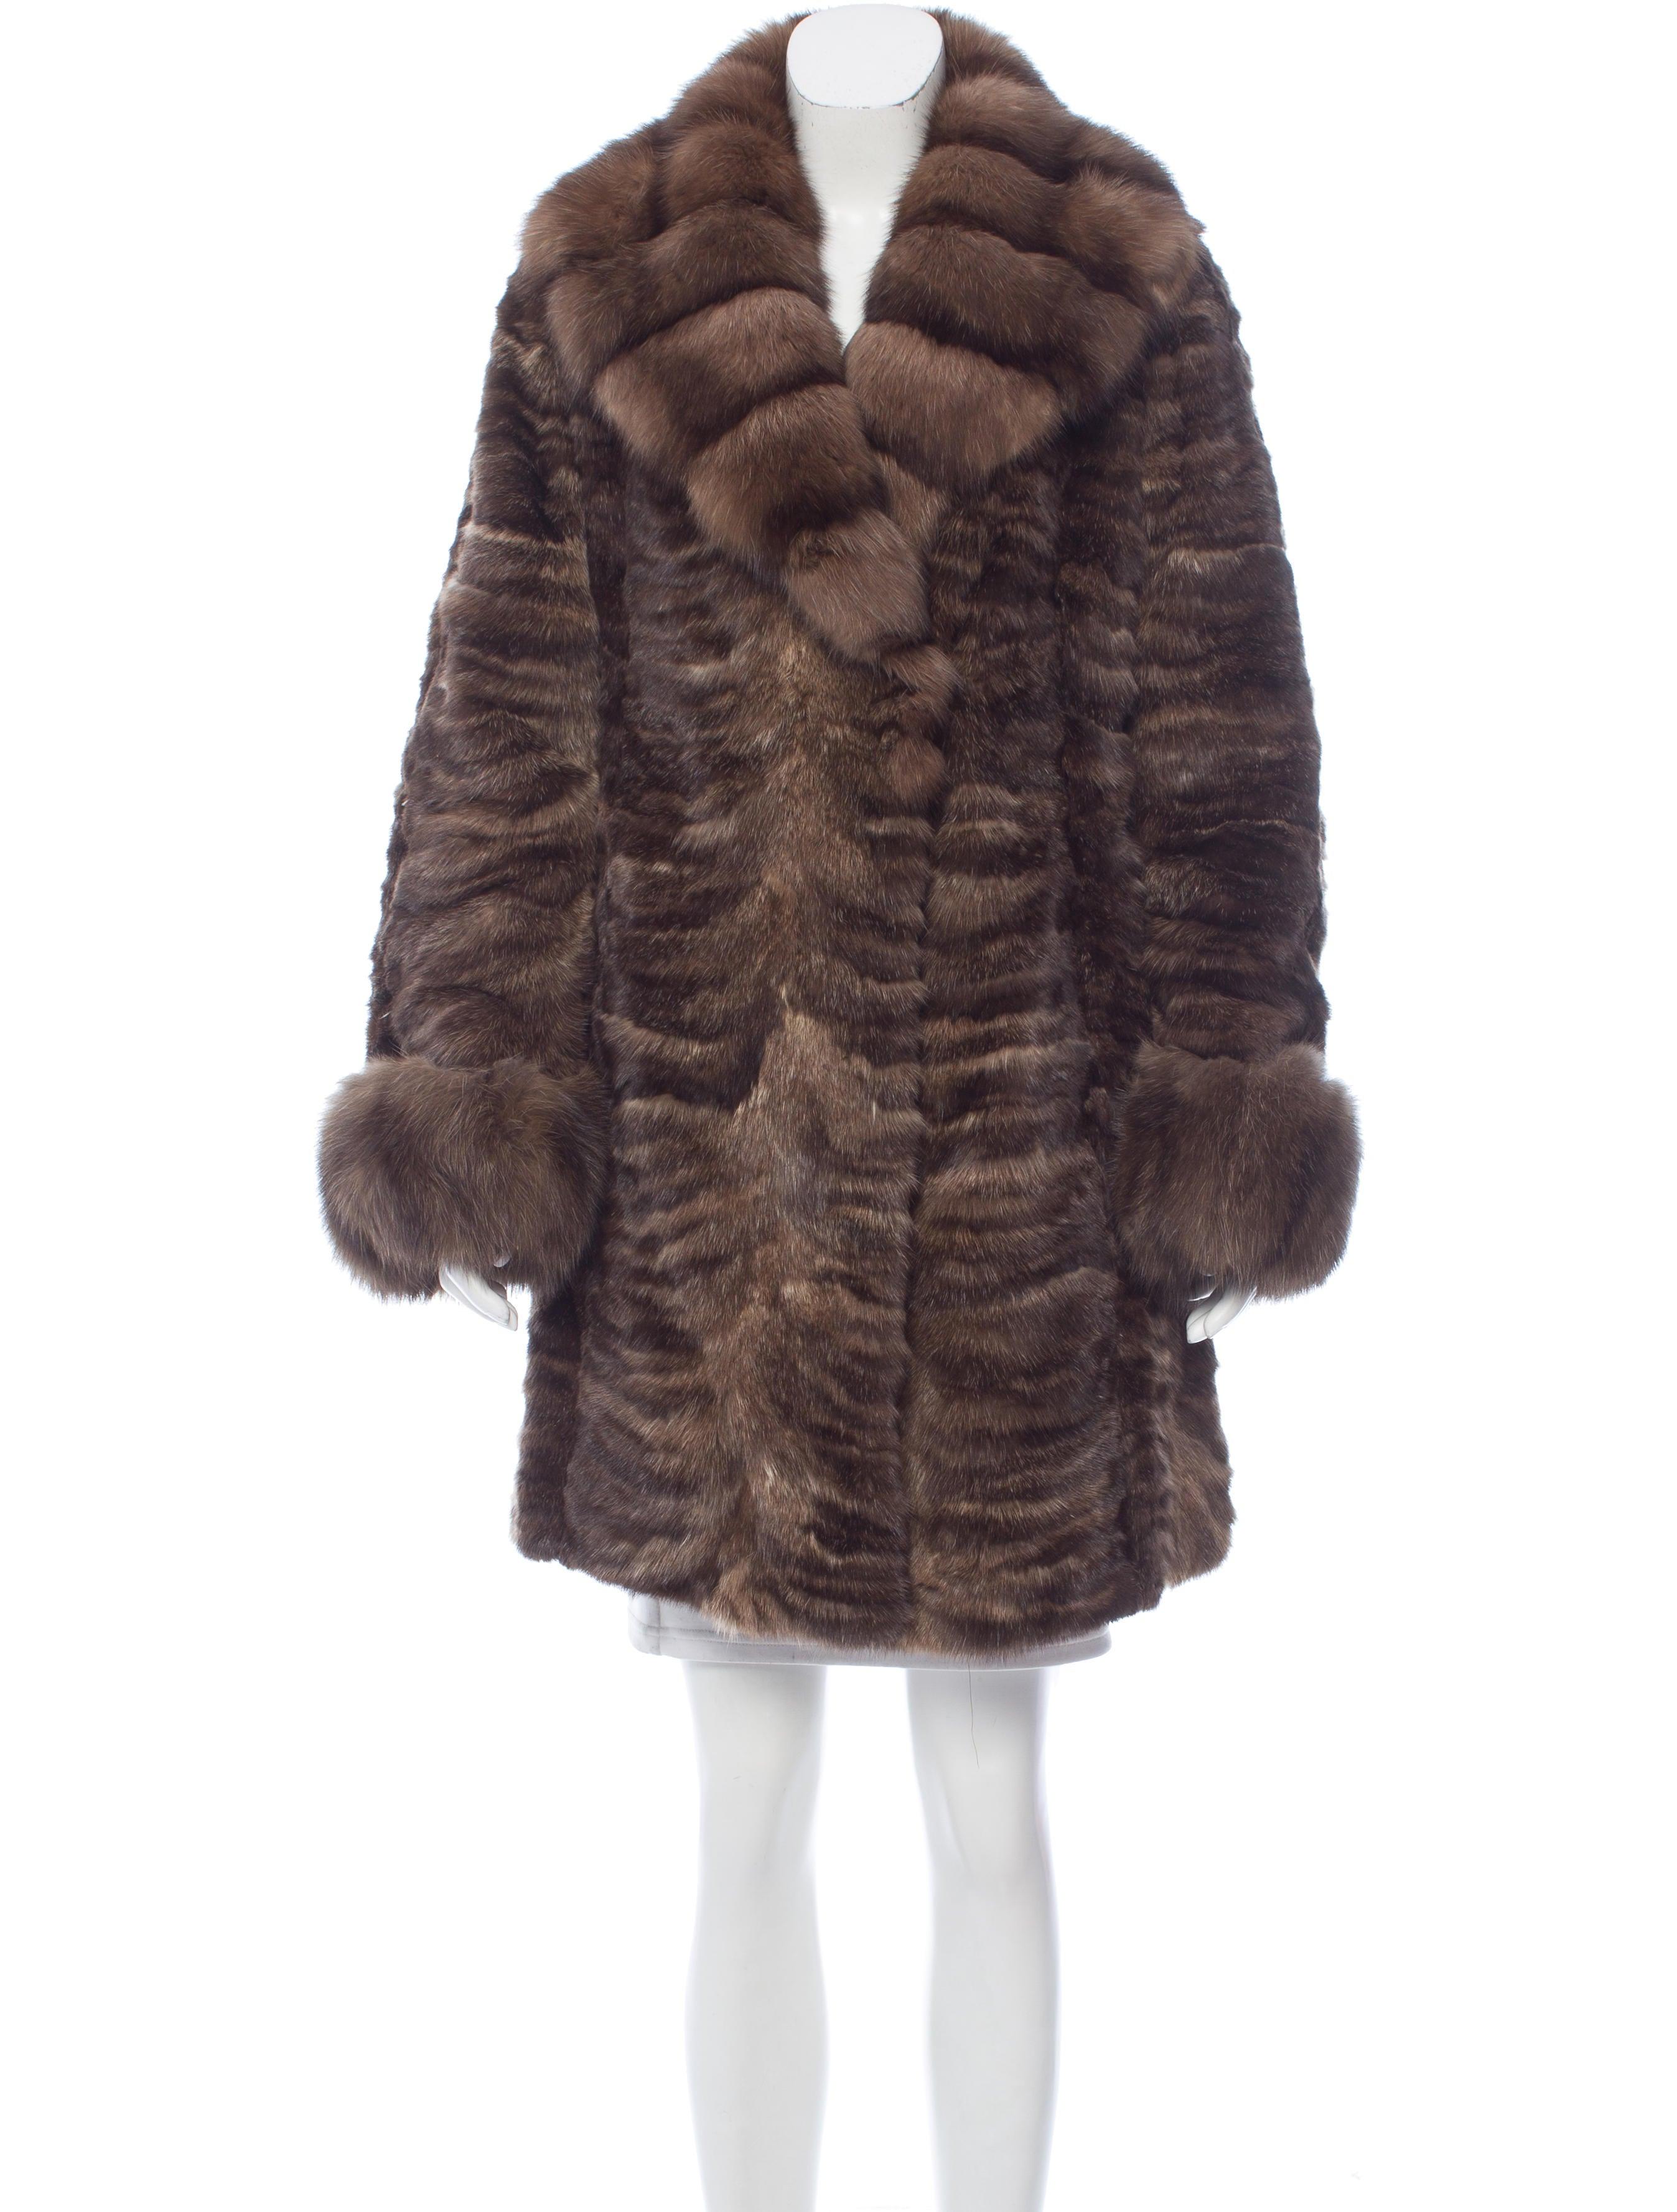 Fur Sheared Sable Fur Coat Clothing Fur22196 The